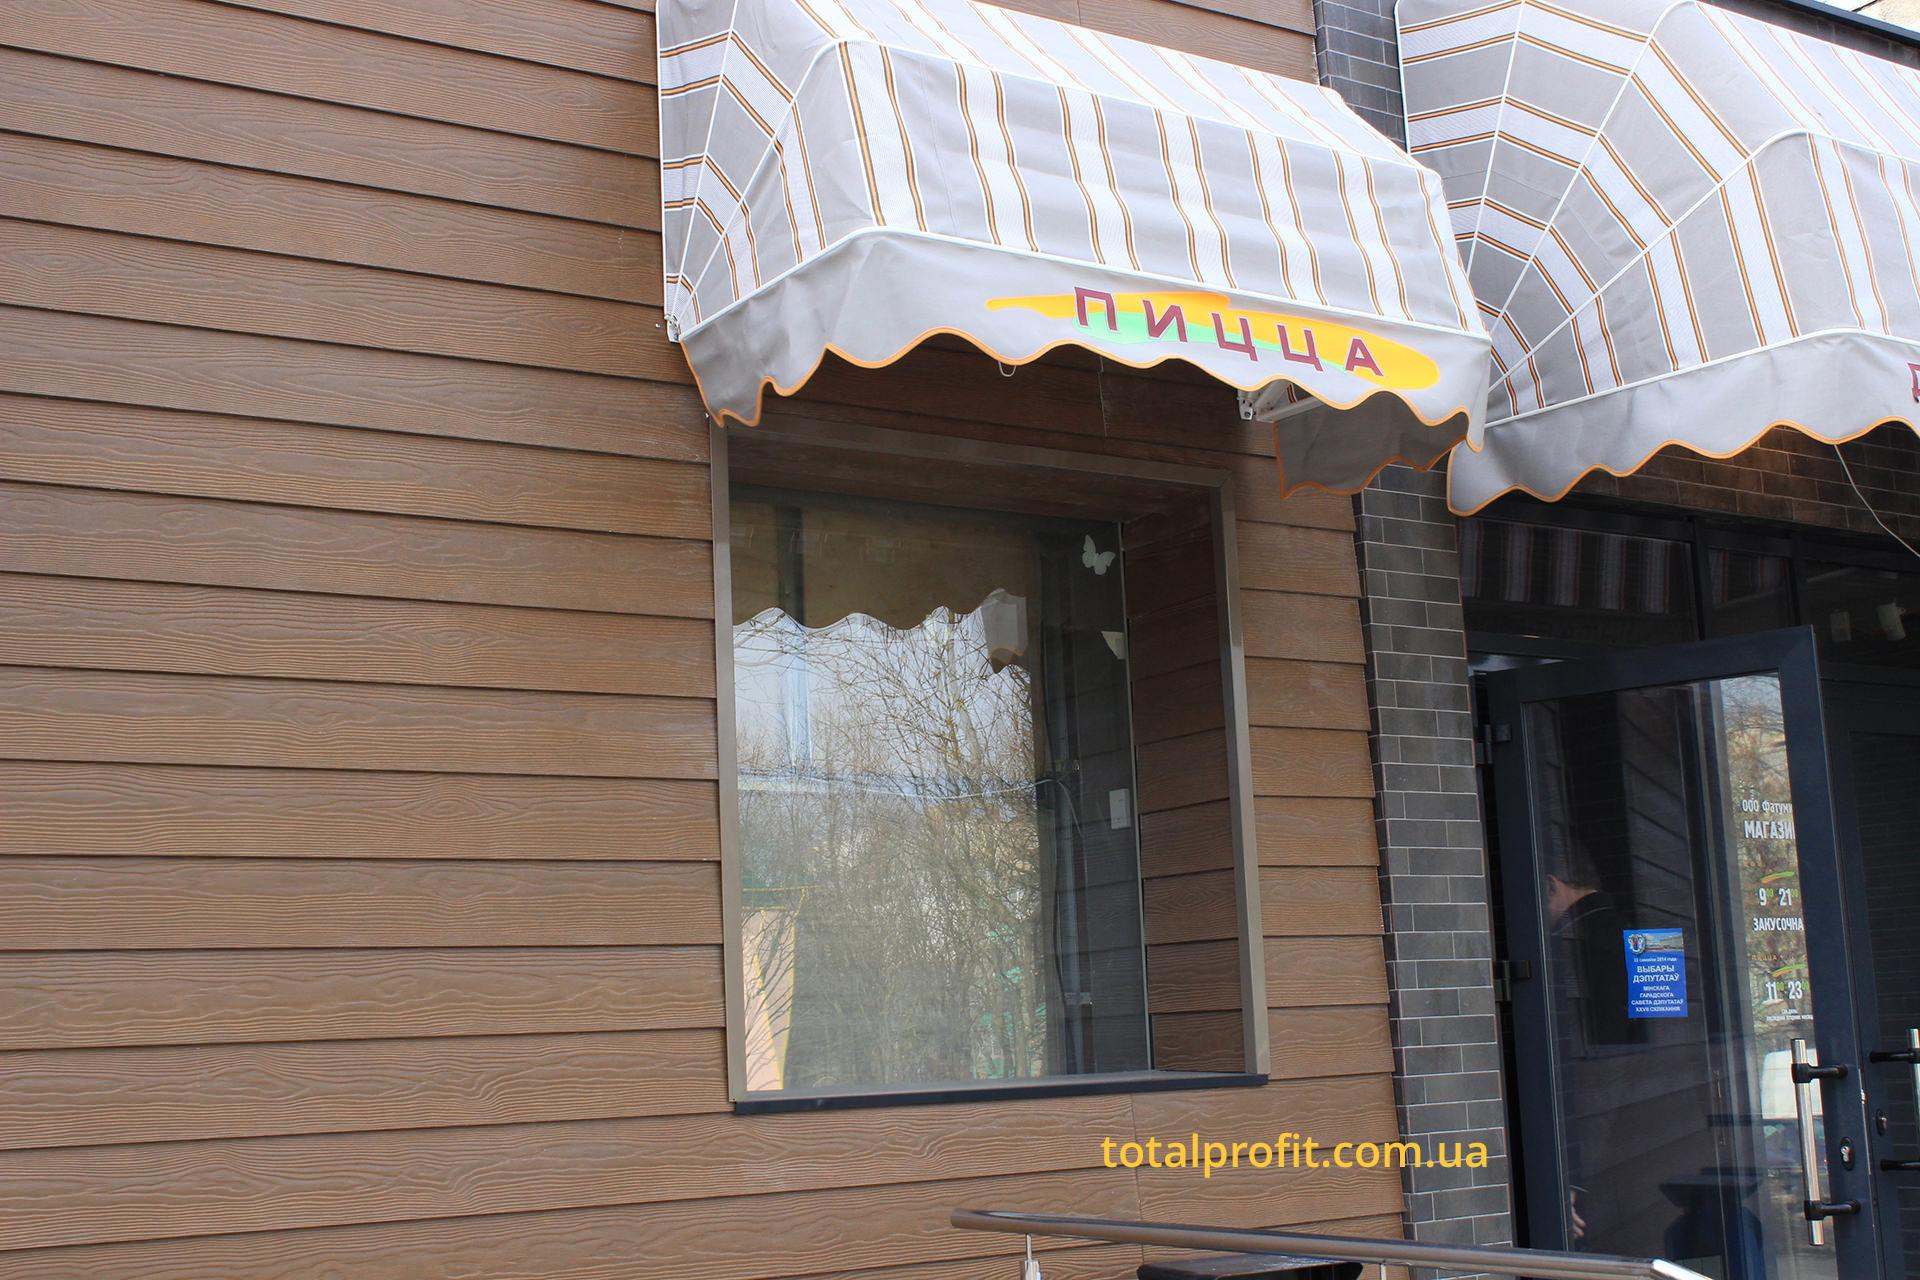 утепление фасада ресторана